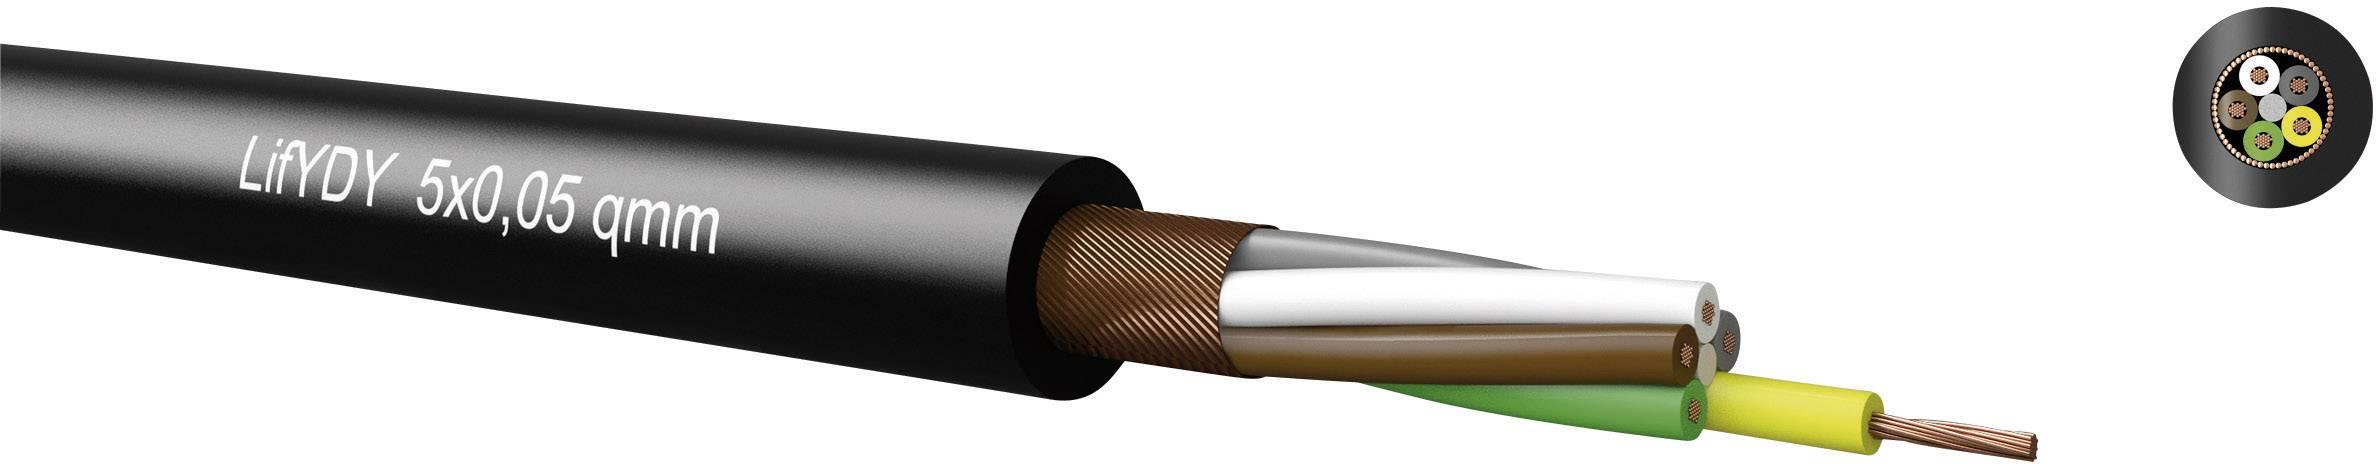 Riadiaci kábel Kabeltronik LifYDY 340501000, 5 x 0.10 mm², vonkajší Ø 4.30 mm, 300 V, metrový tovar, čierna